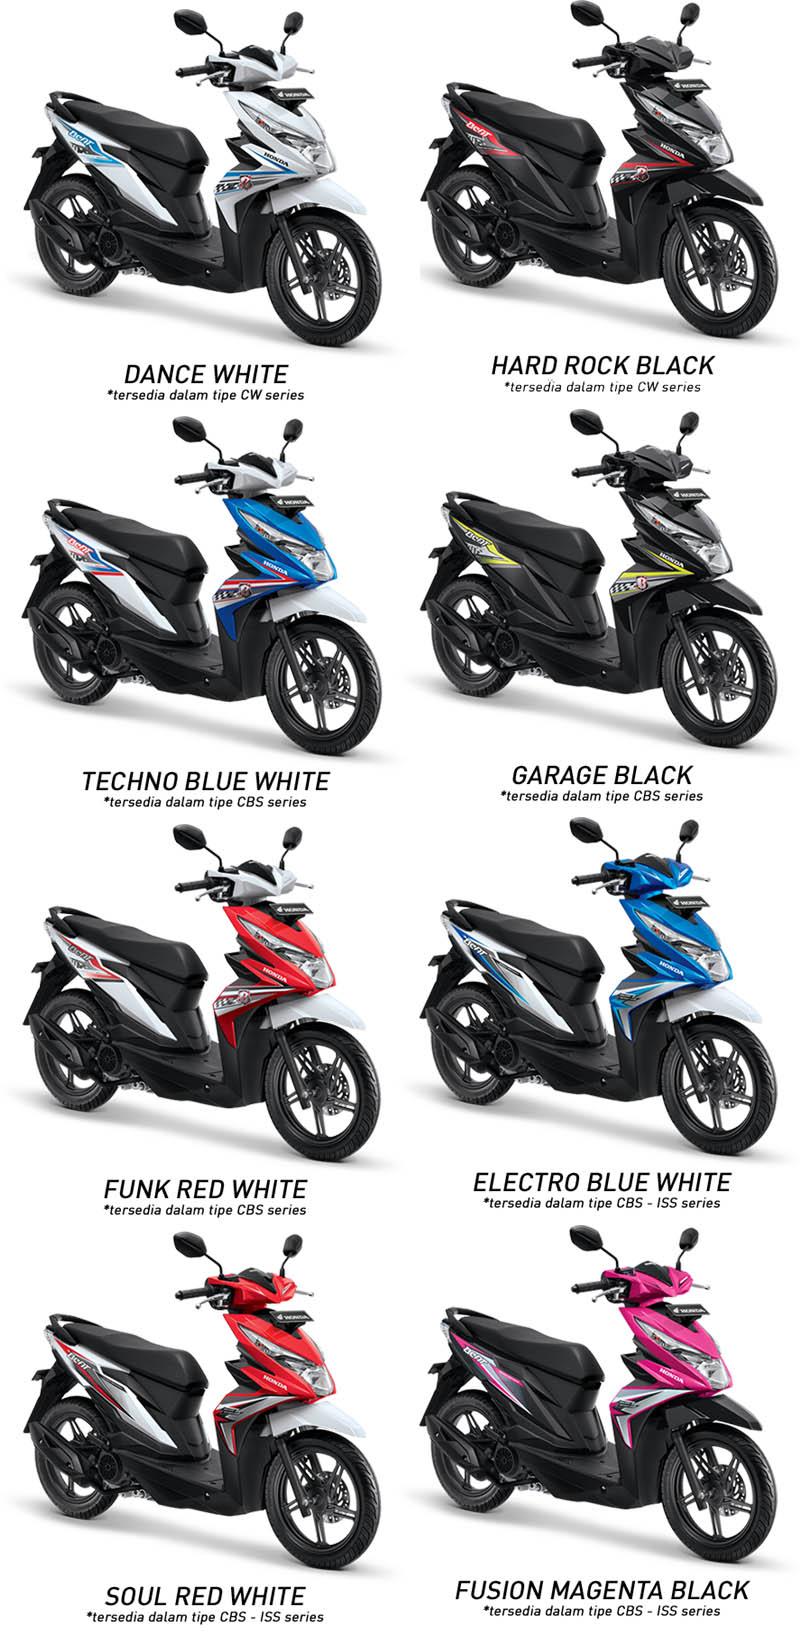 Honda Beat Sporty Cbs Iss Electro Blue White Spec Dan Daftar Harga New Vario 110 Esp Grande Yogyakarta Pilihan Warna Terbaru 2018